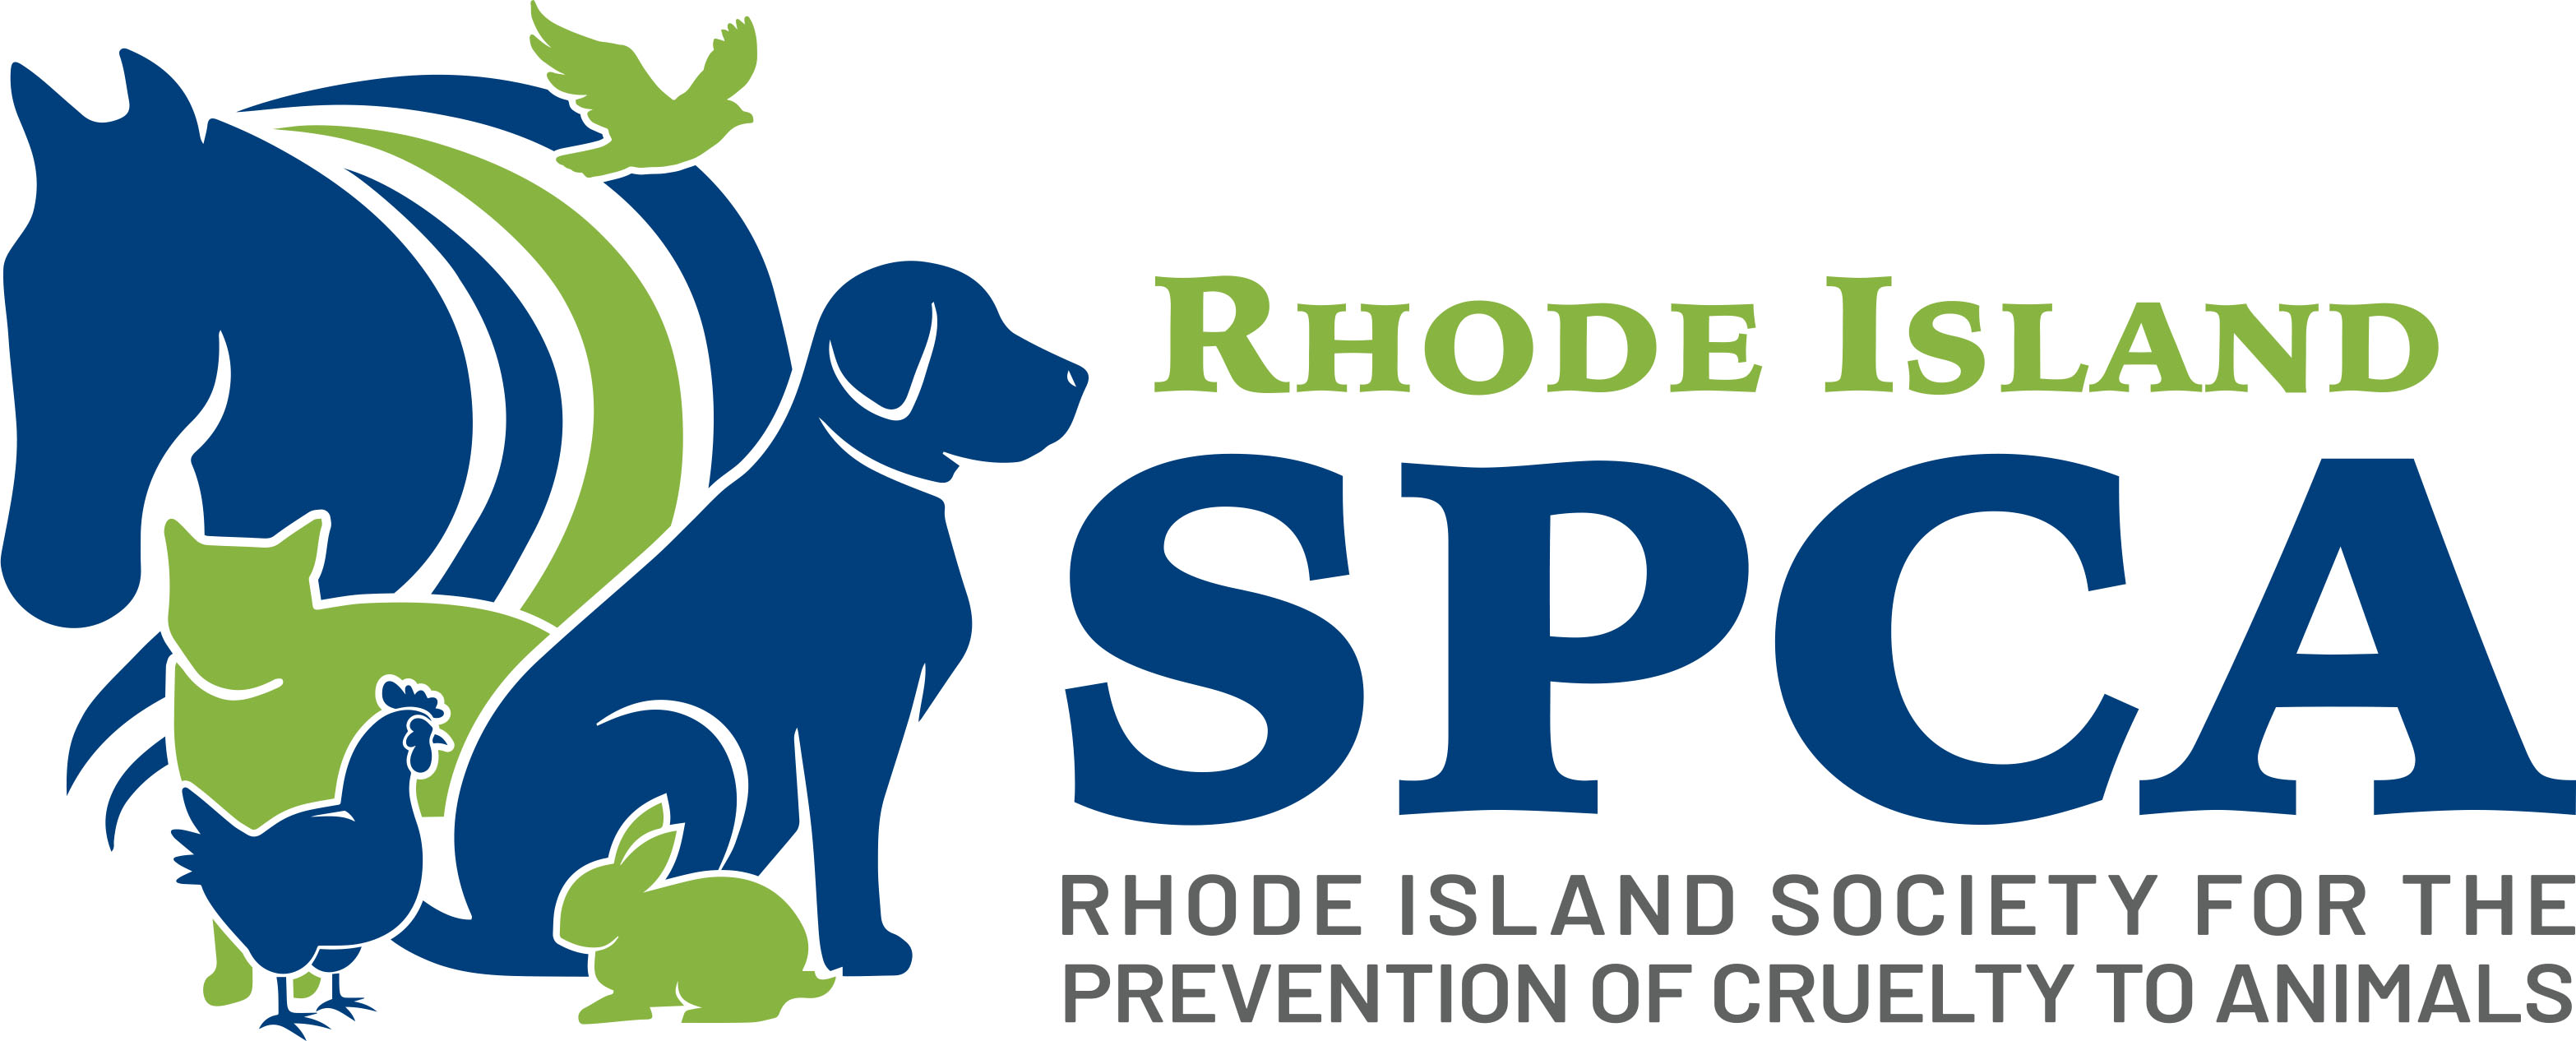 Rhode Island SPCA